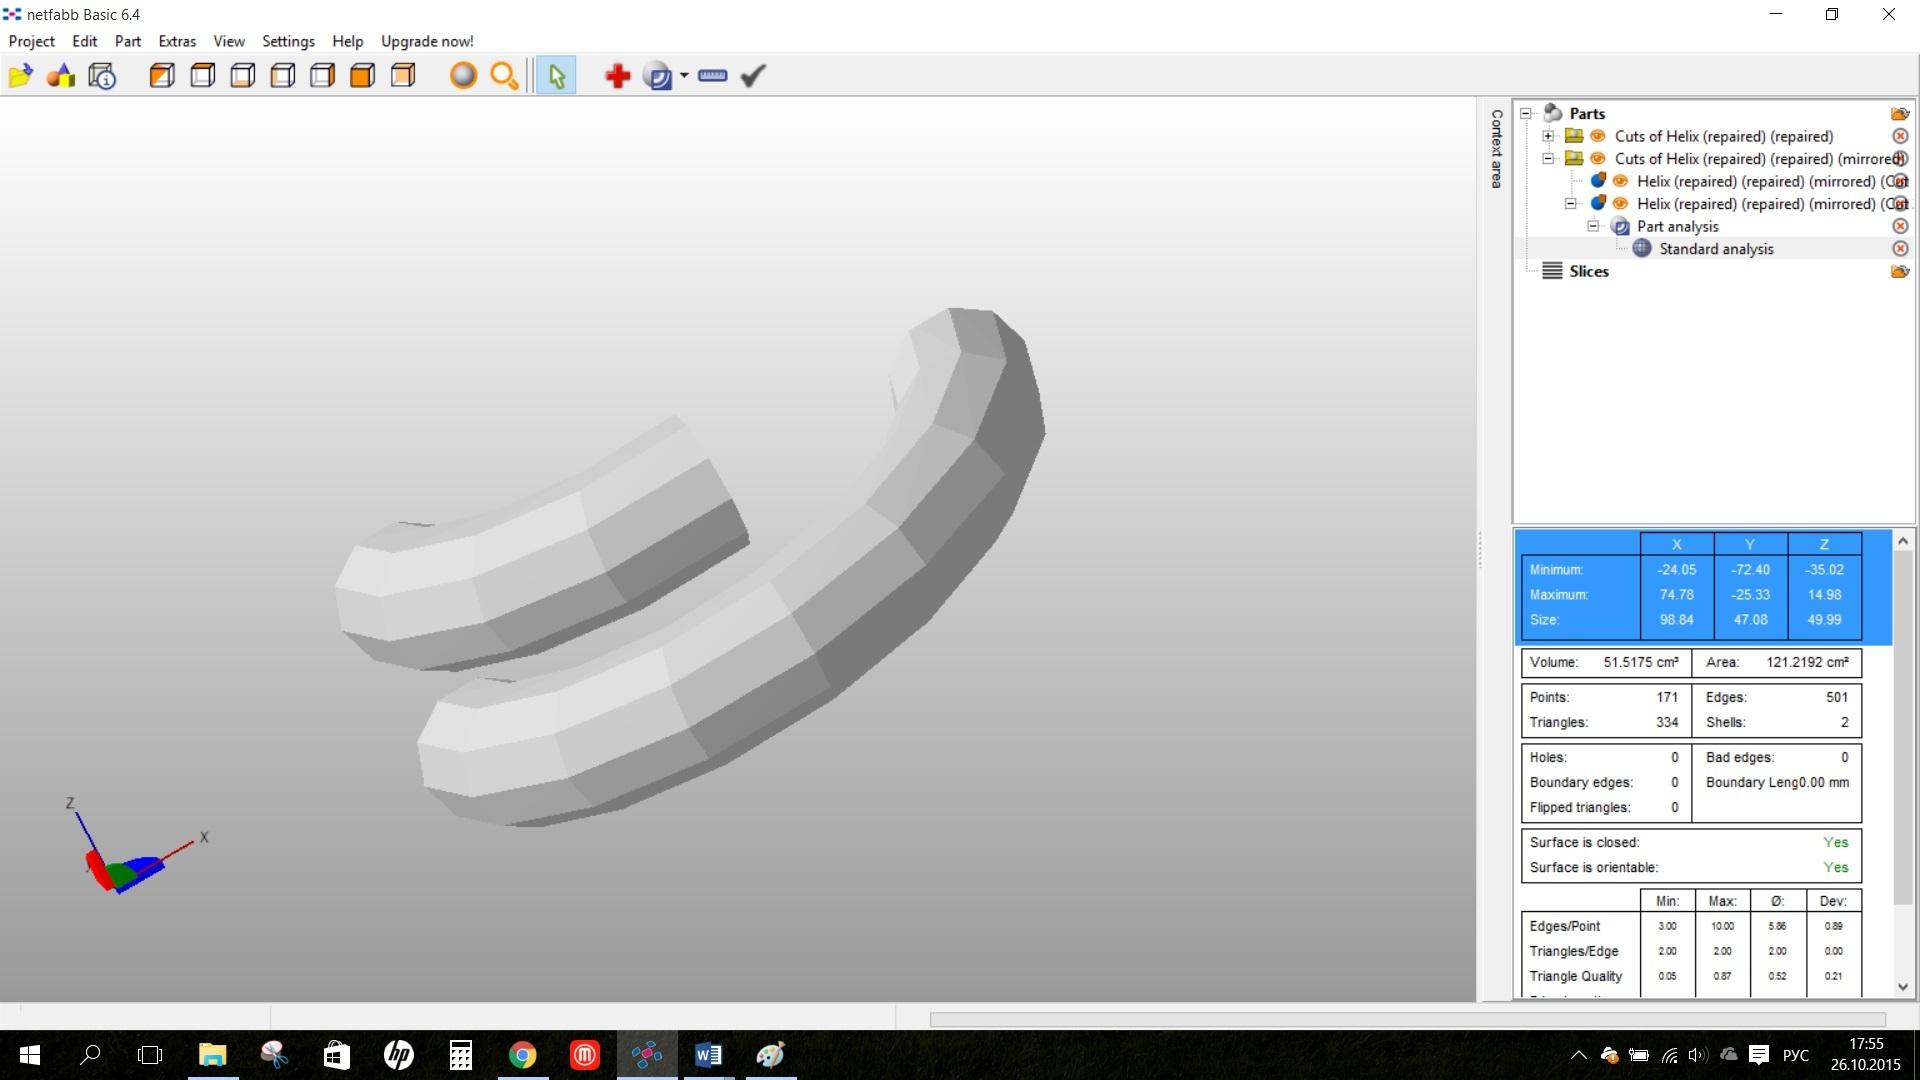 Обзор ПО для 3D-печати Netfabb Studio 6 - 12